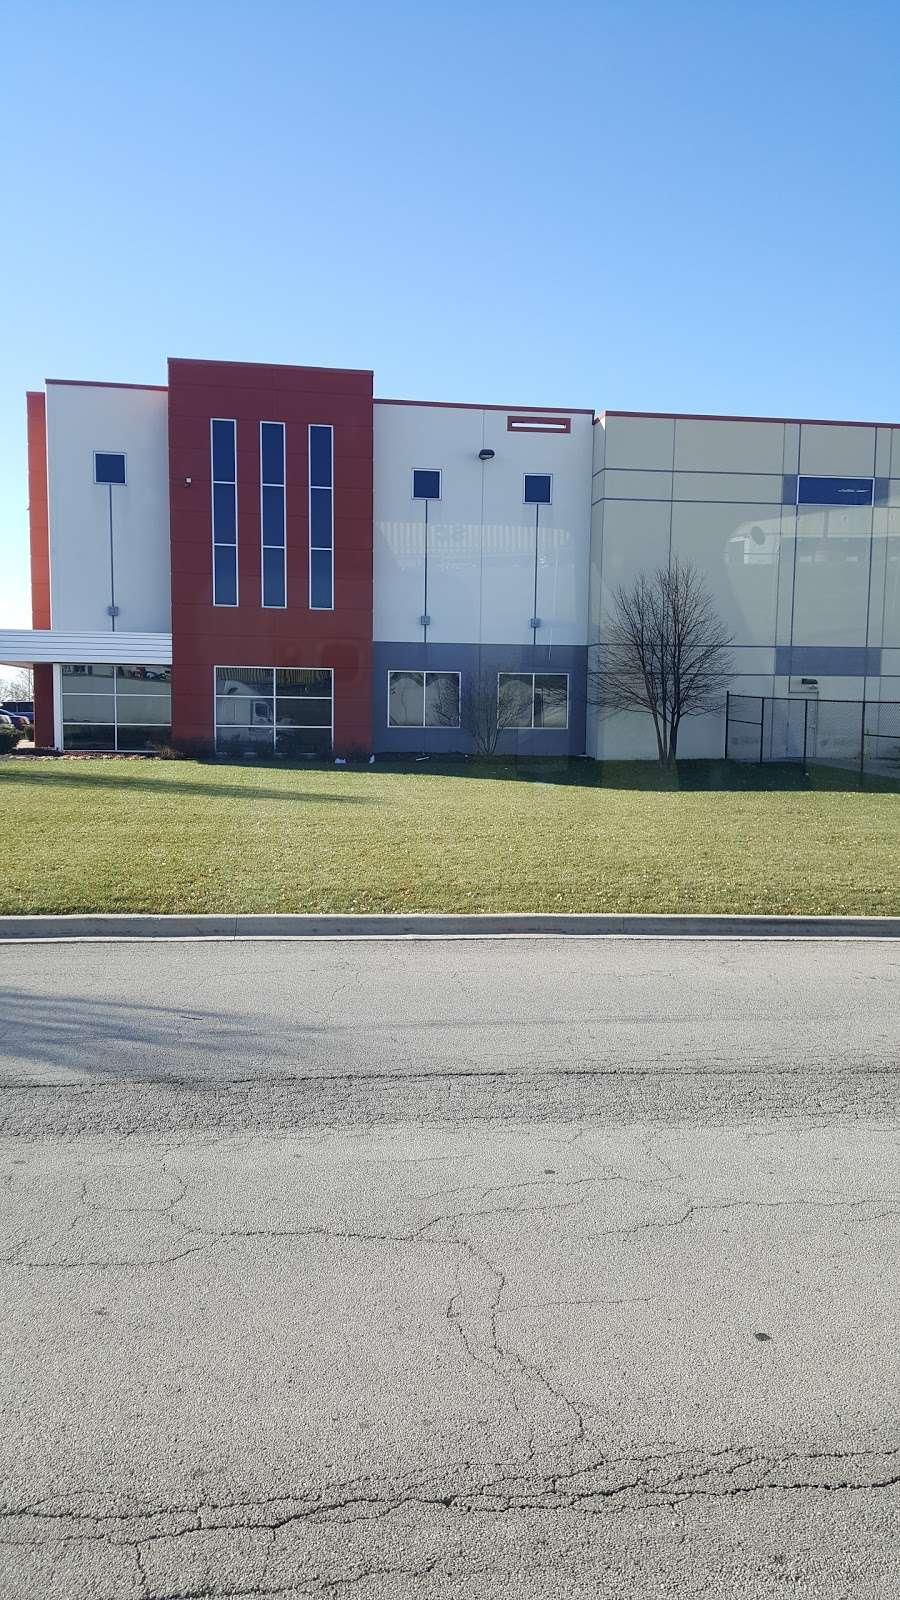 Electrolux - storage  | Photo 4 of 8 | Address: 801 Mid Point Rd, Minooka, IL 60447, USA | Phone: (815) 521-2200